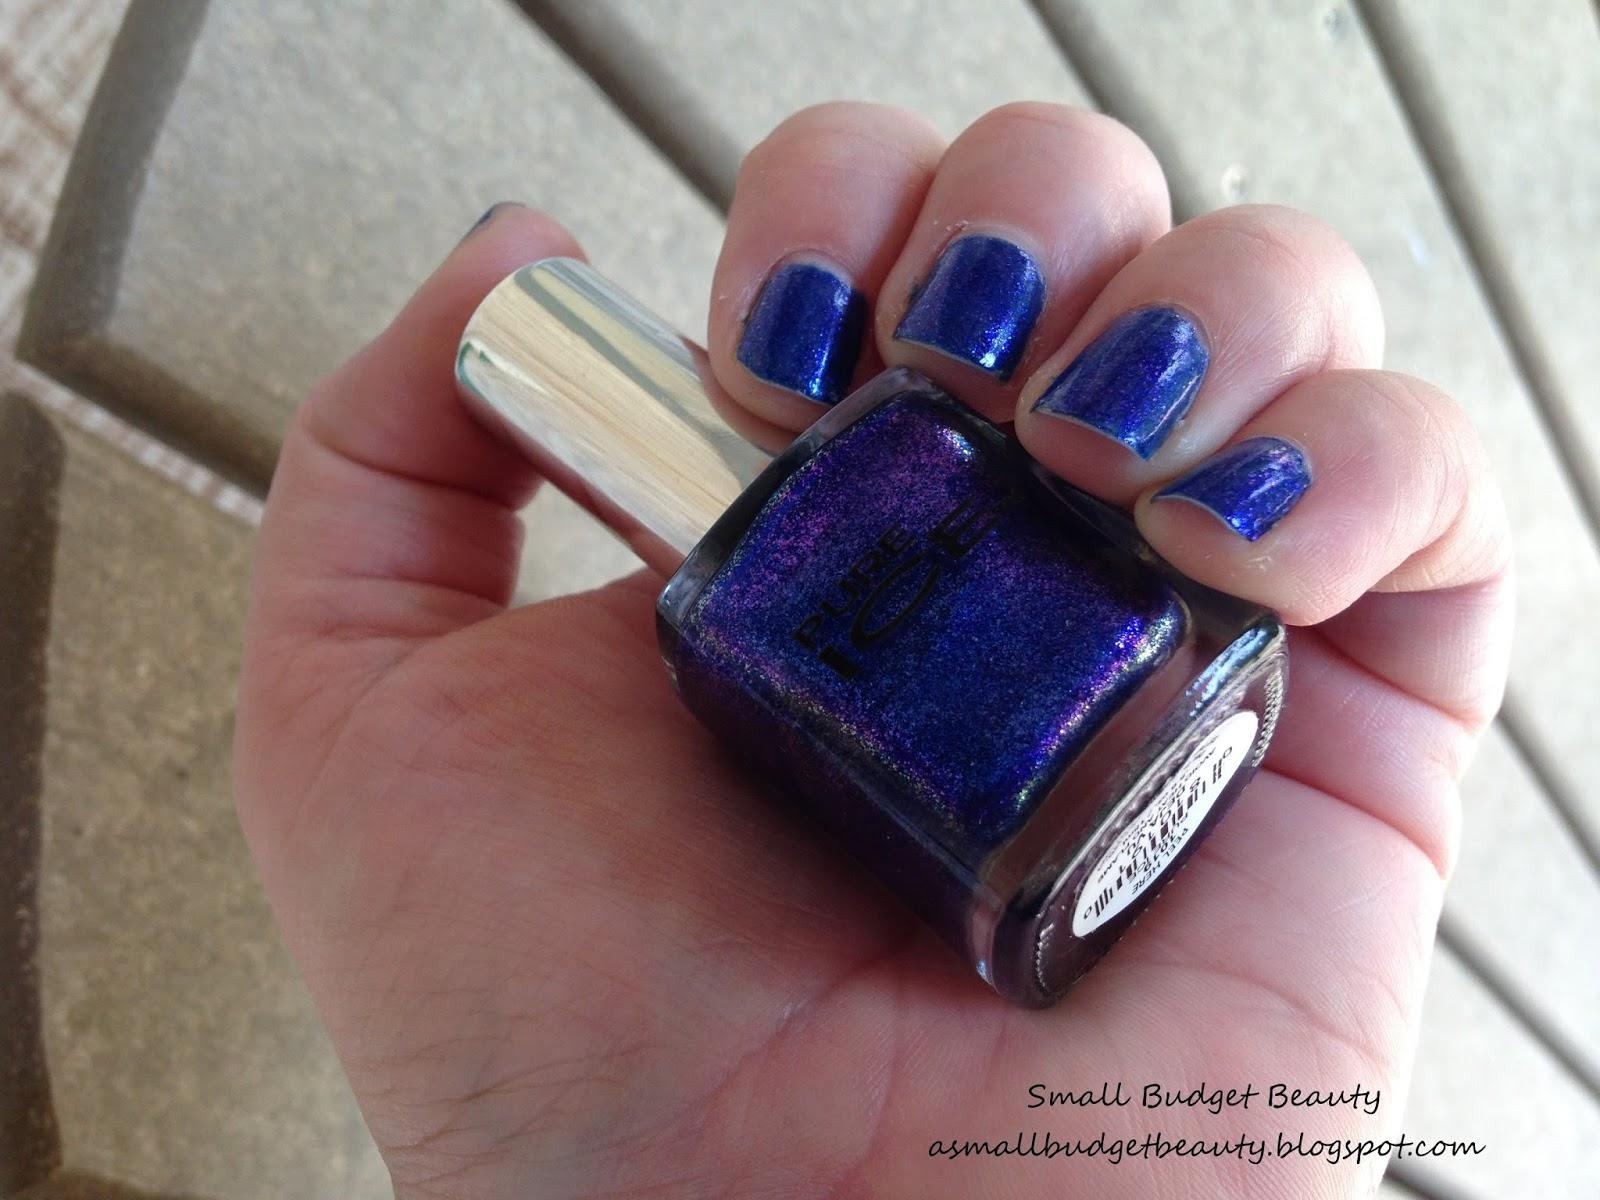 Small Budget Beauty: Pure Ice: Deja Vu